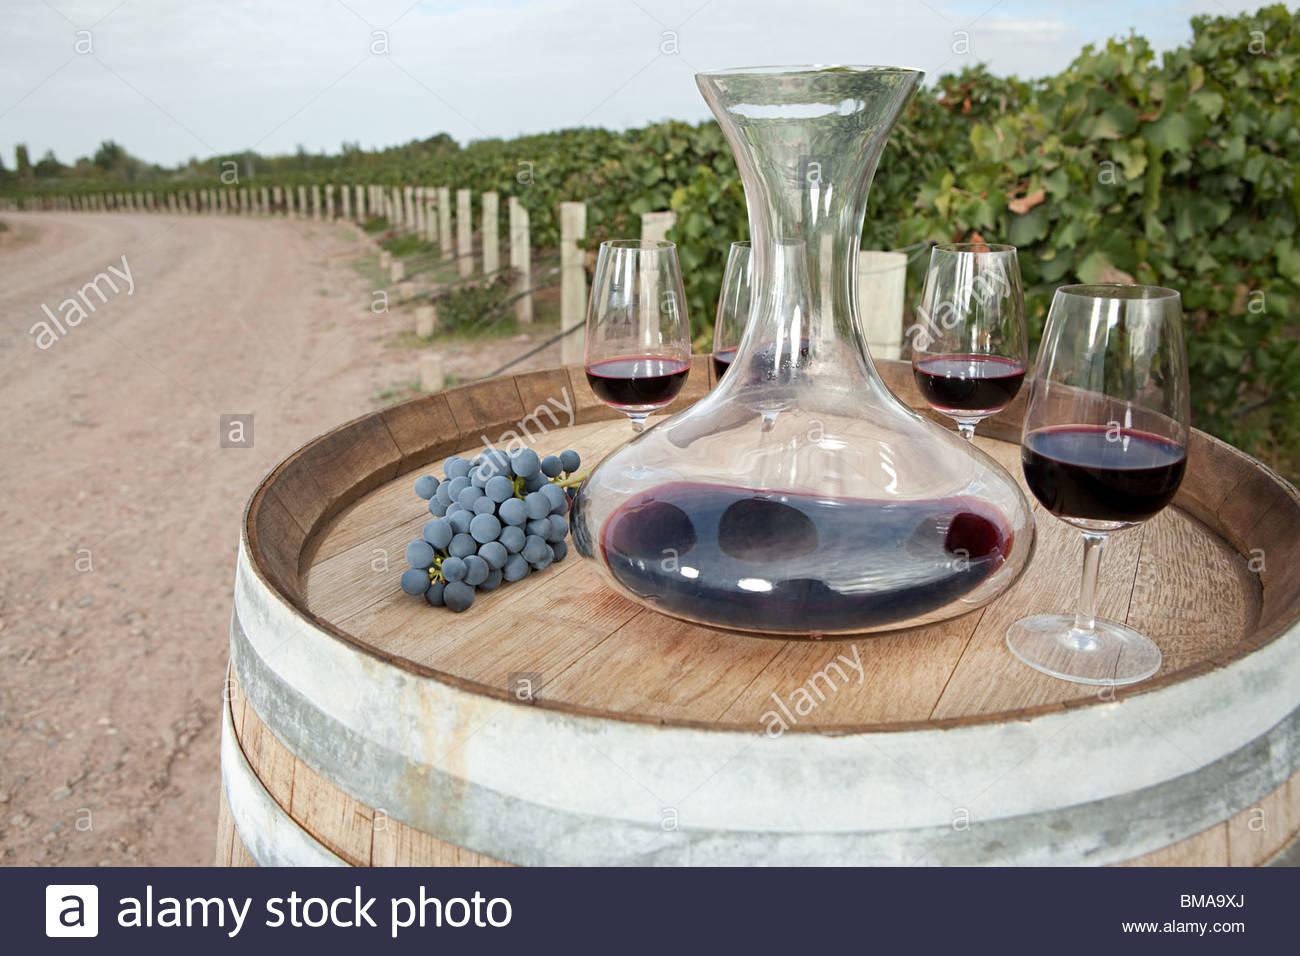 Red wine in vineyard - Stock Image